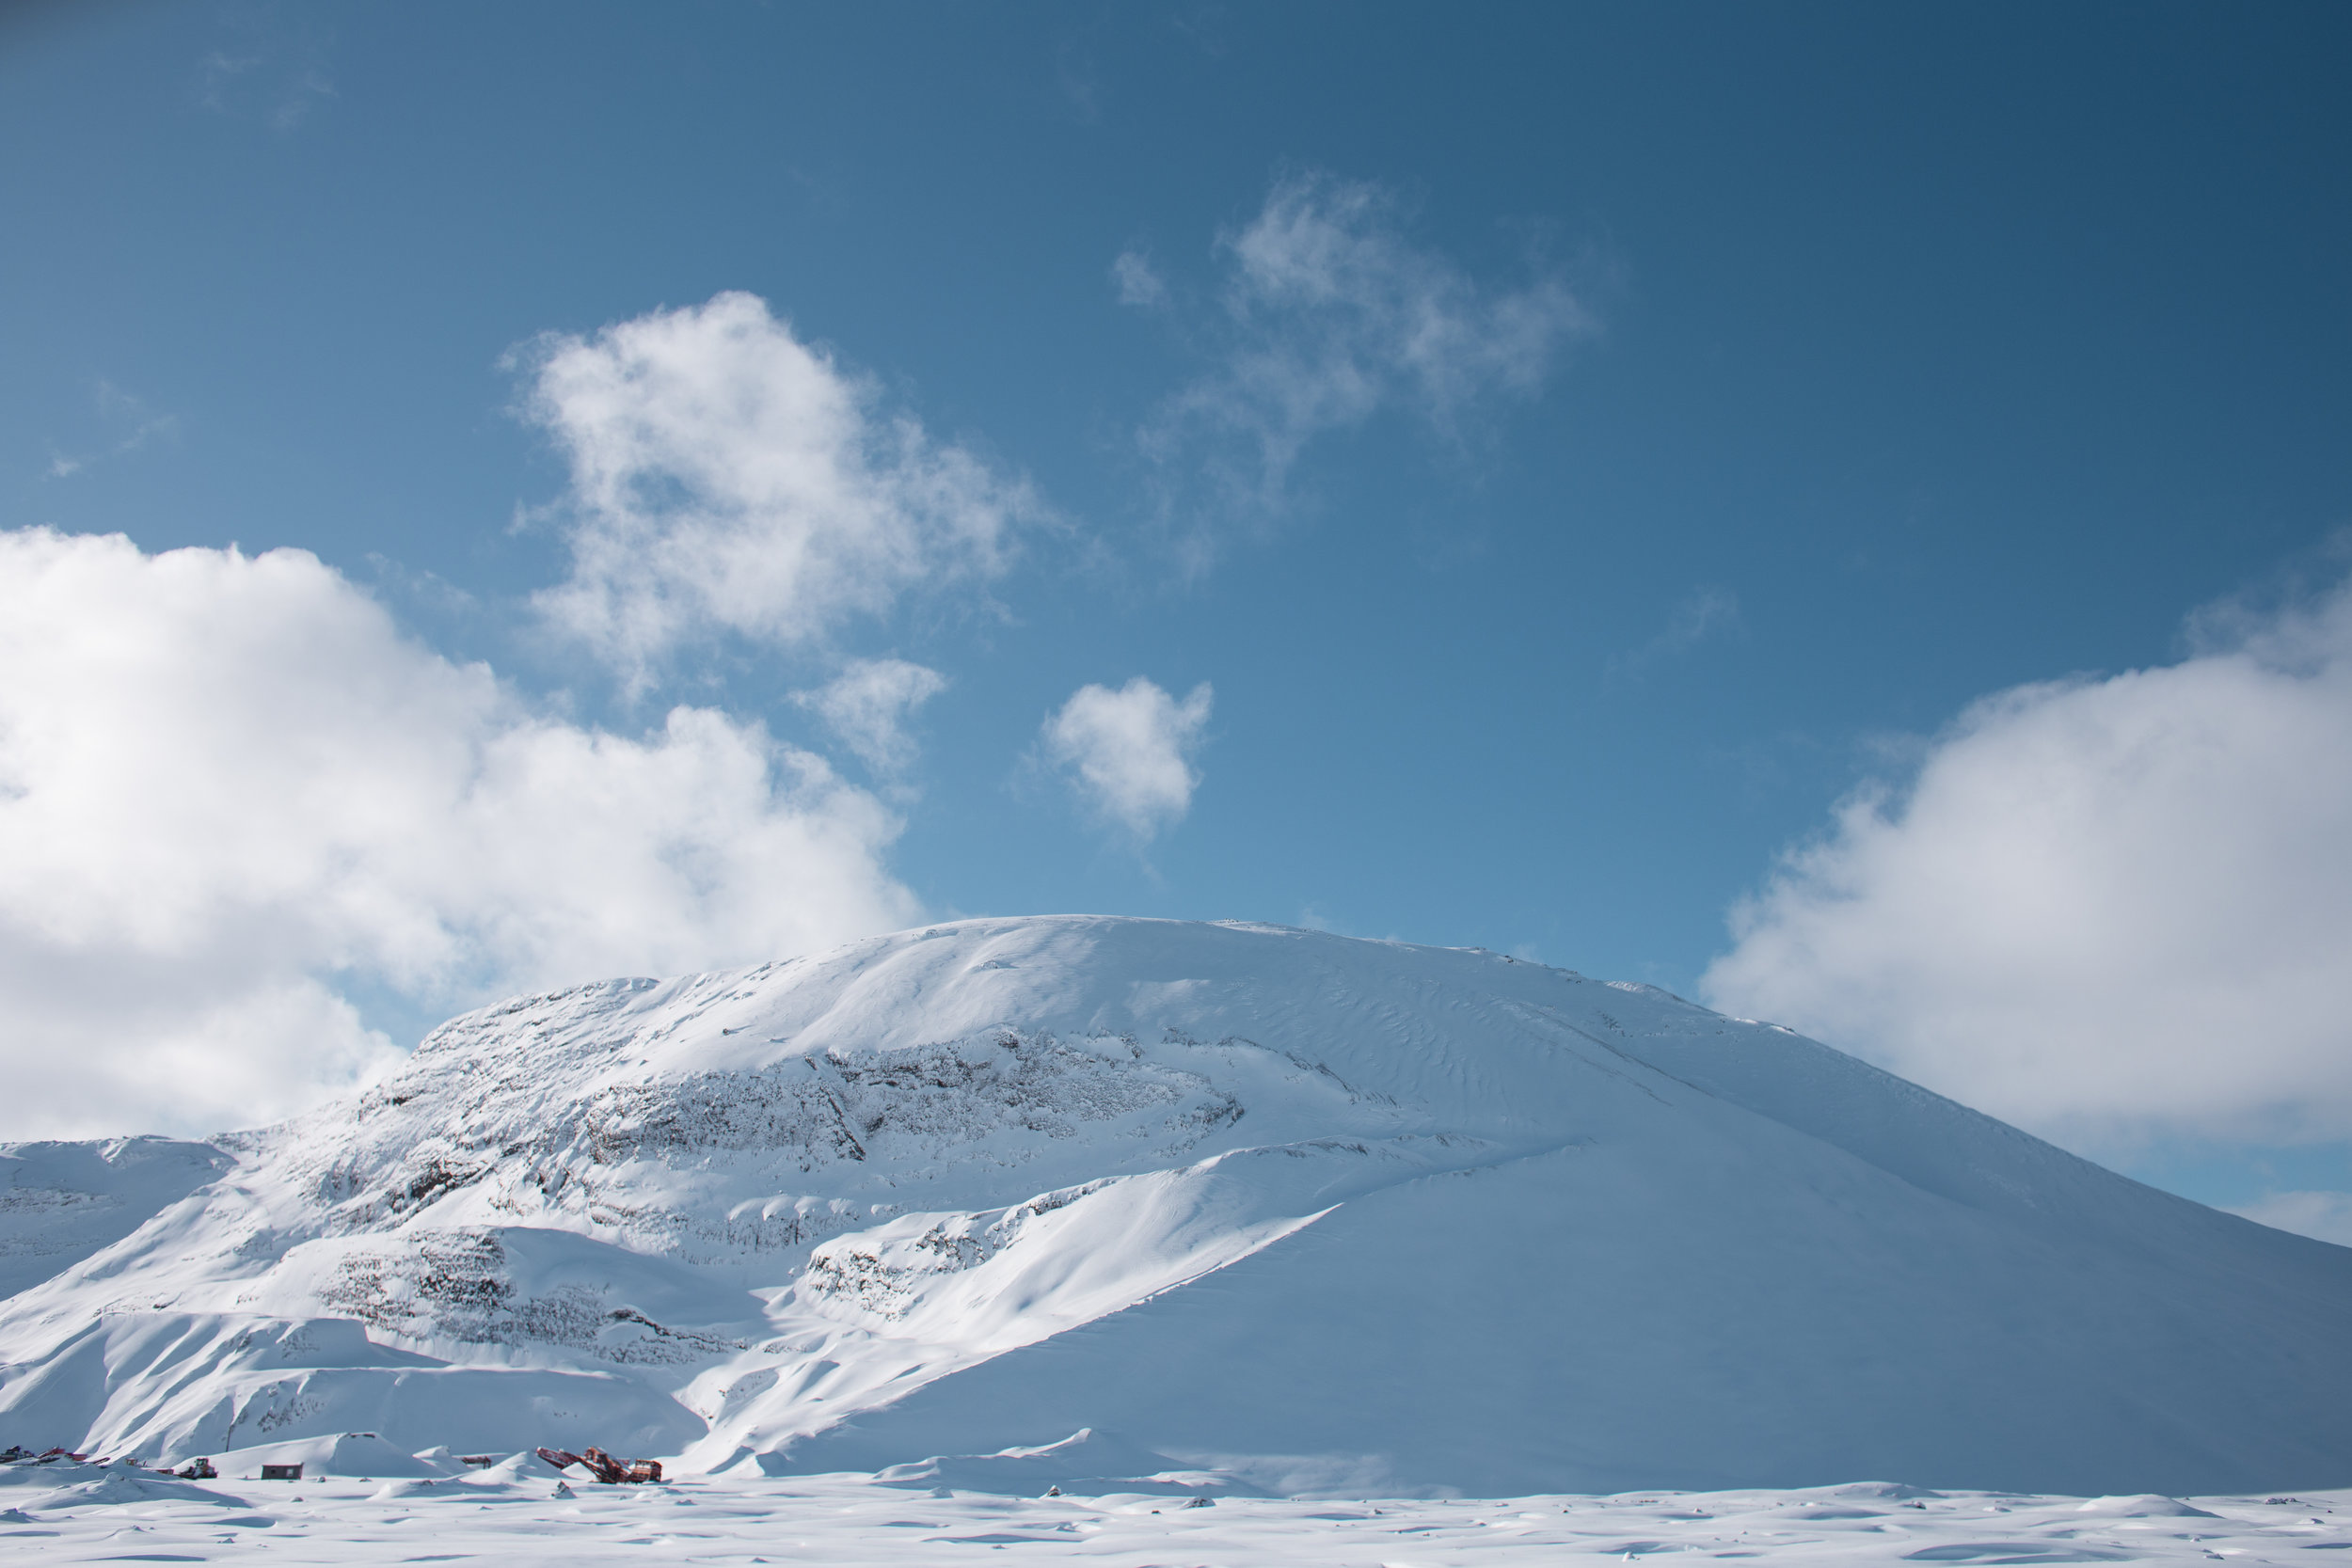 jermiah-schuster-iceland-468.jpg